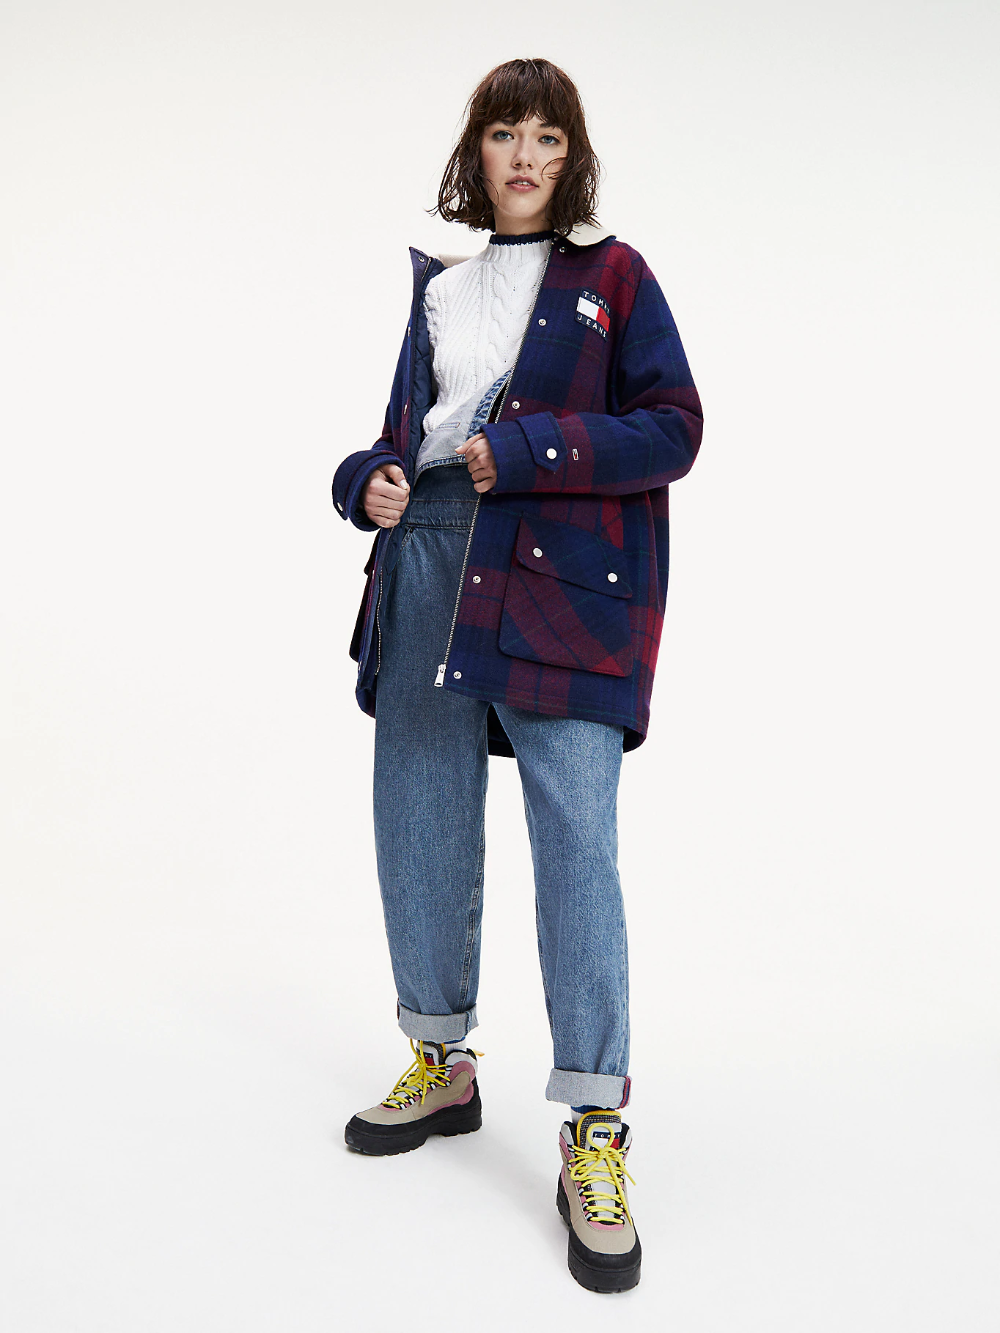 Check Corduroy Coat Blue Tommy Hilfiger Tommy Hilfiger Coat Coats For Women Outerwear Jackets [ 1333 x 1000 Pixel ]